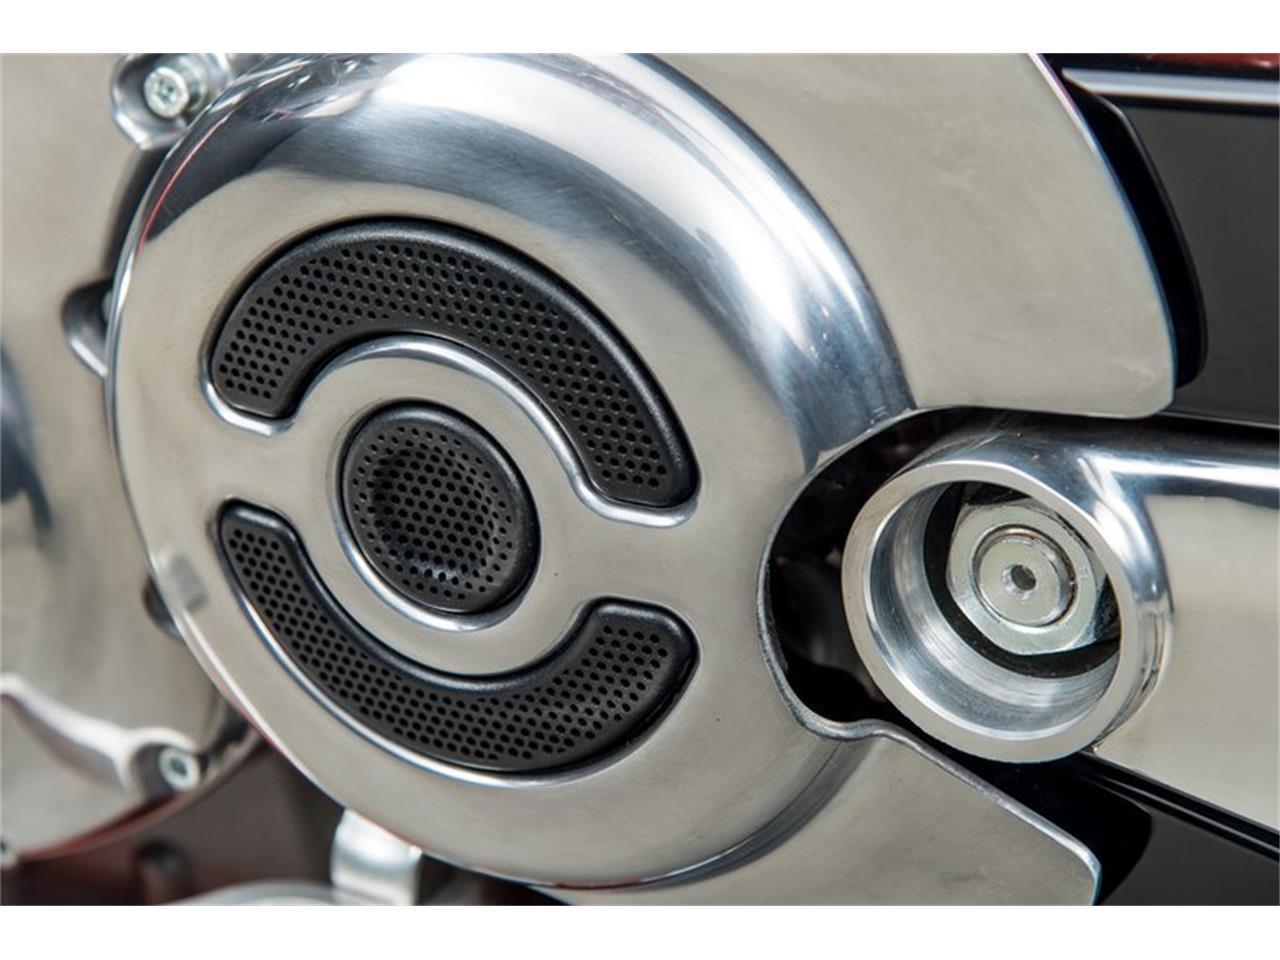 2006 Harley-Davidson VRXSE (CC-1251040) for sale in Scotts Valley, California